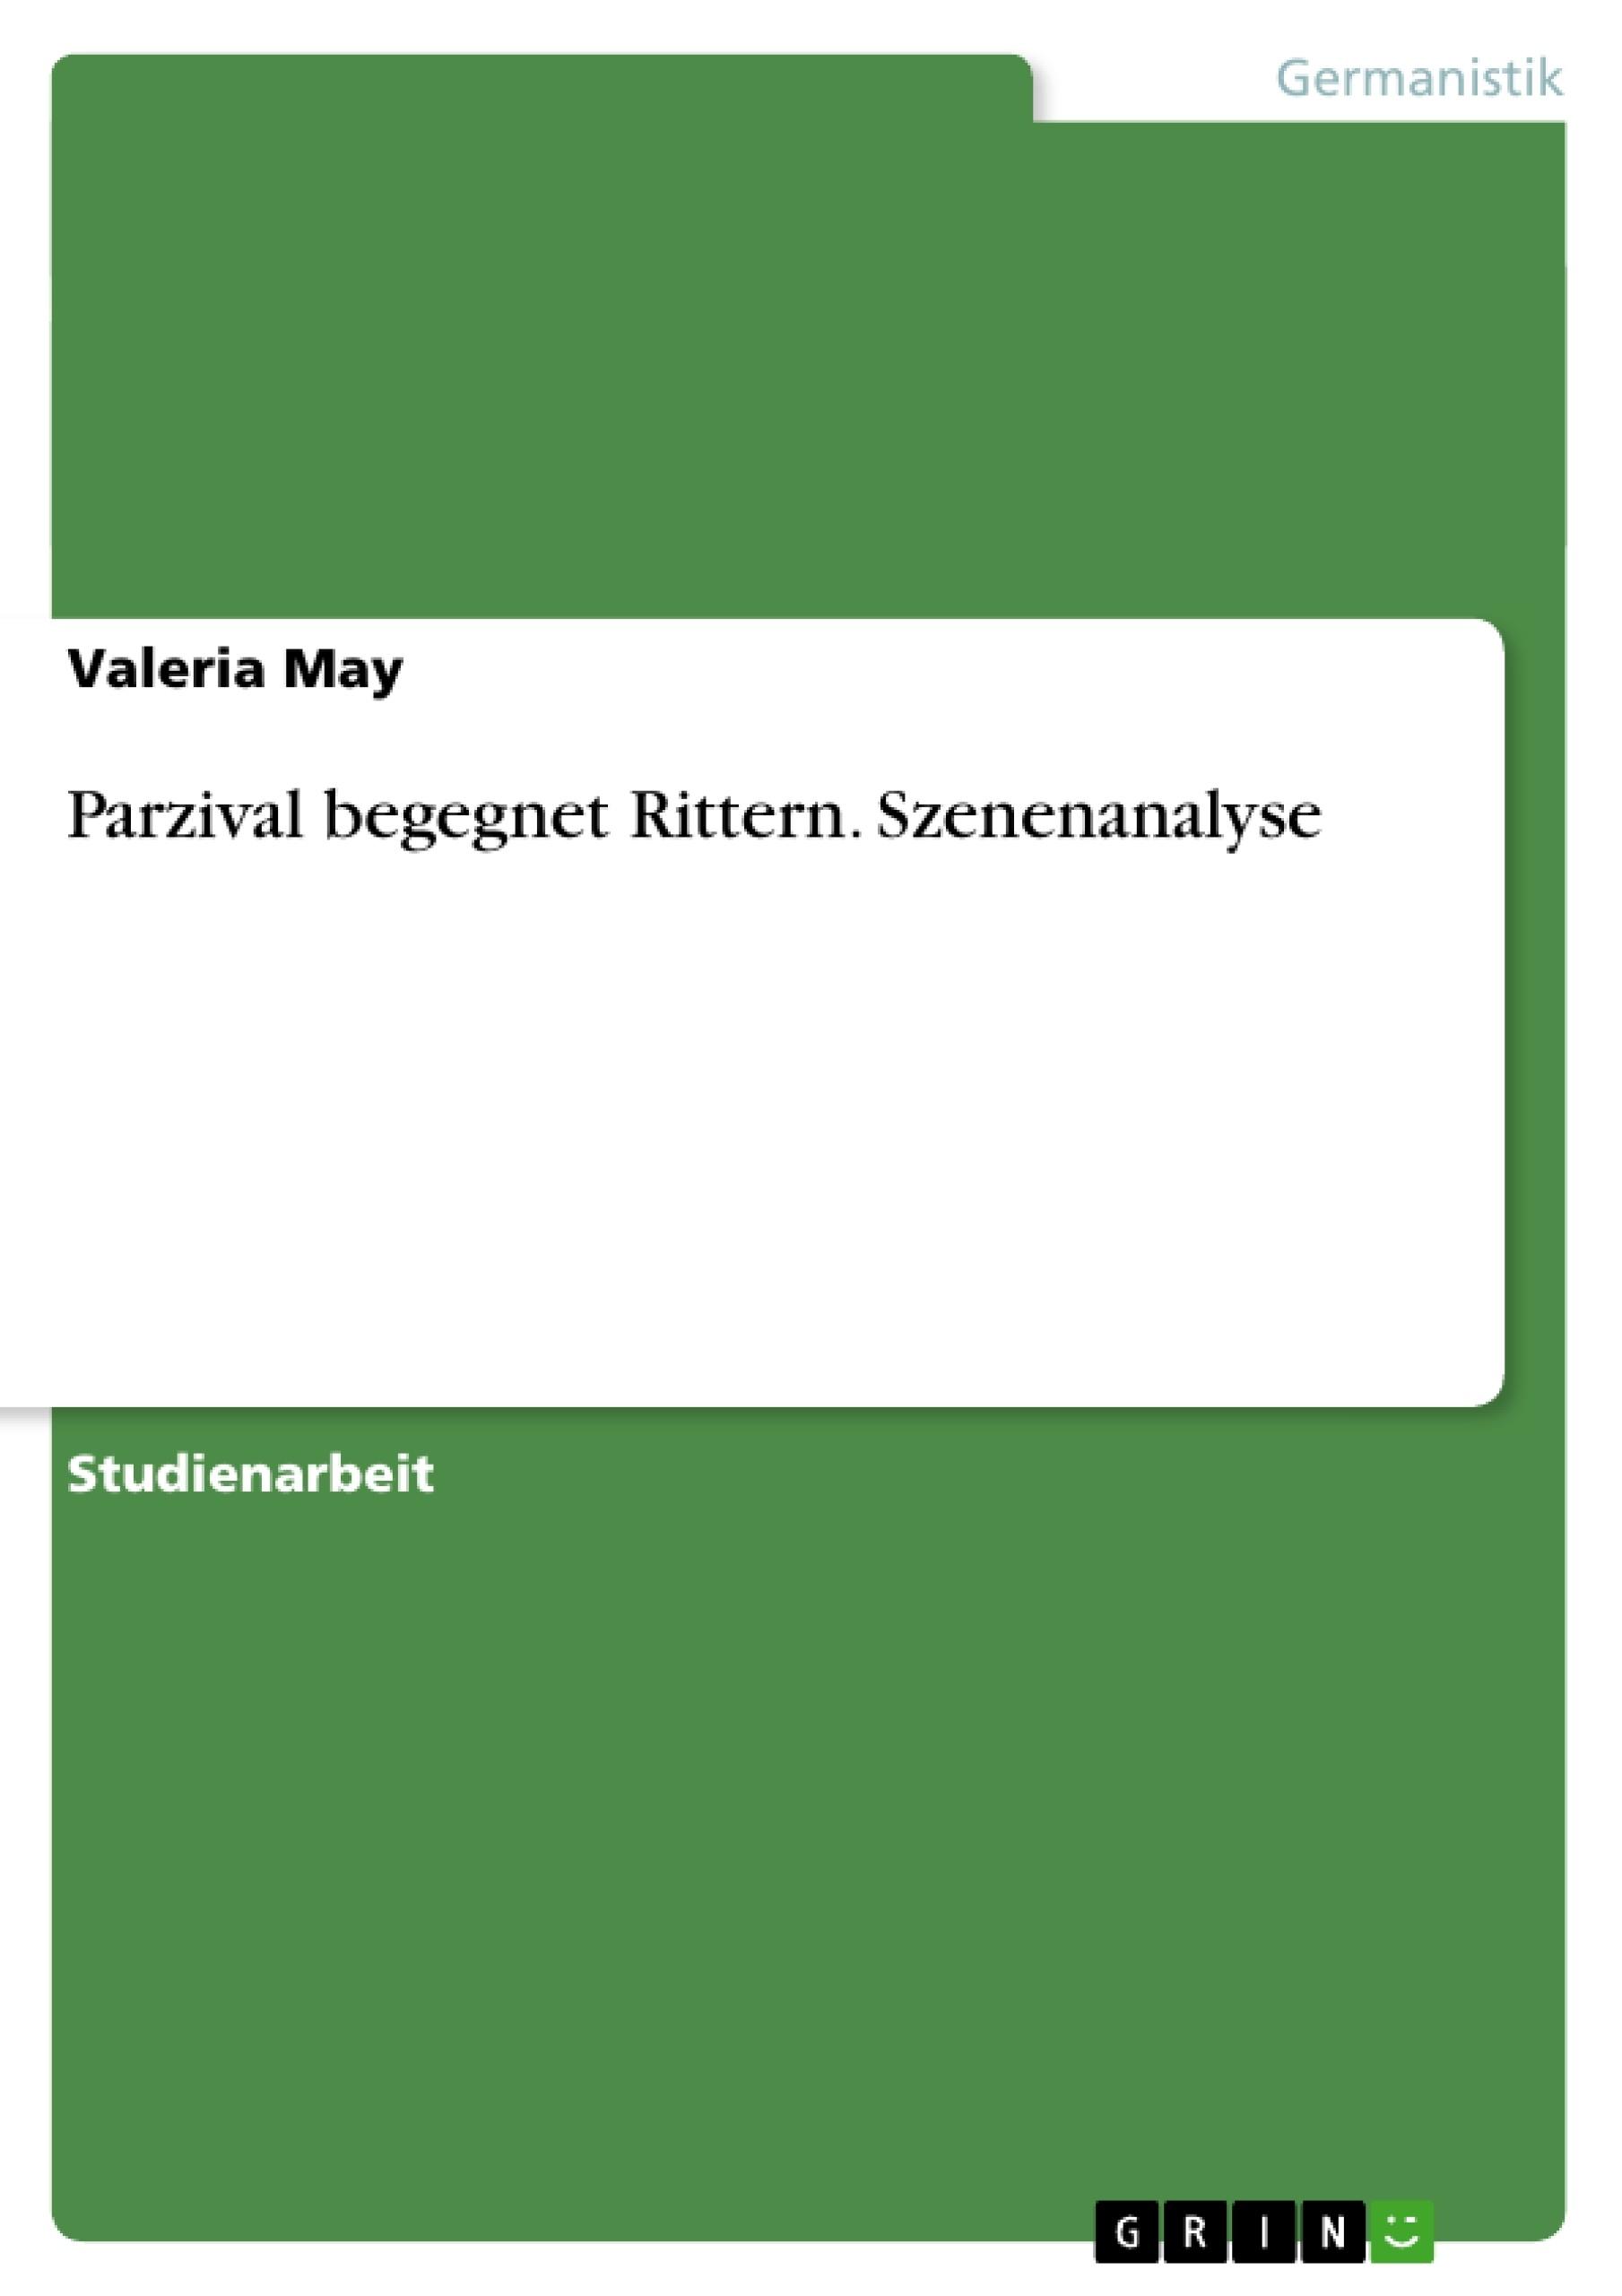 Titel: Parzival begegnet Rittern. Szenenanalyse